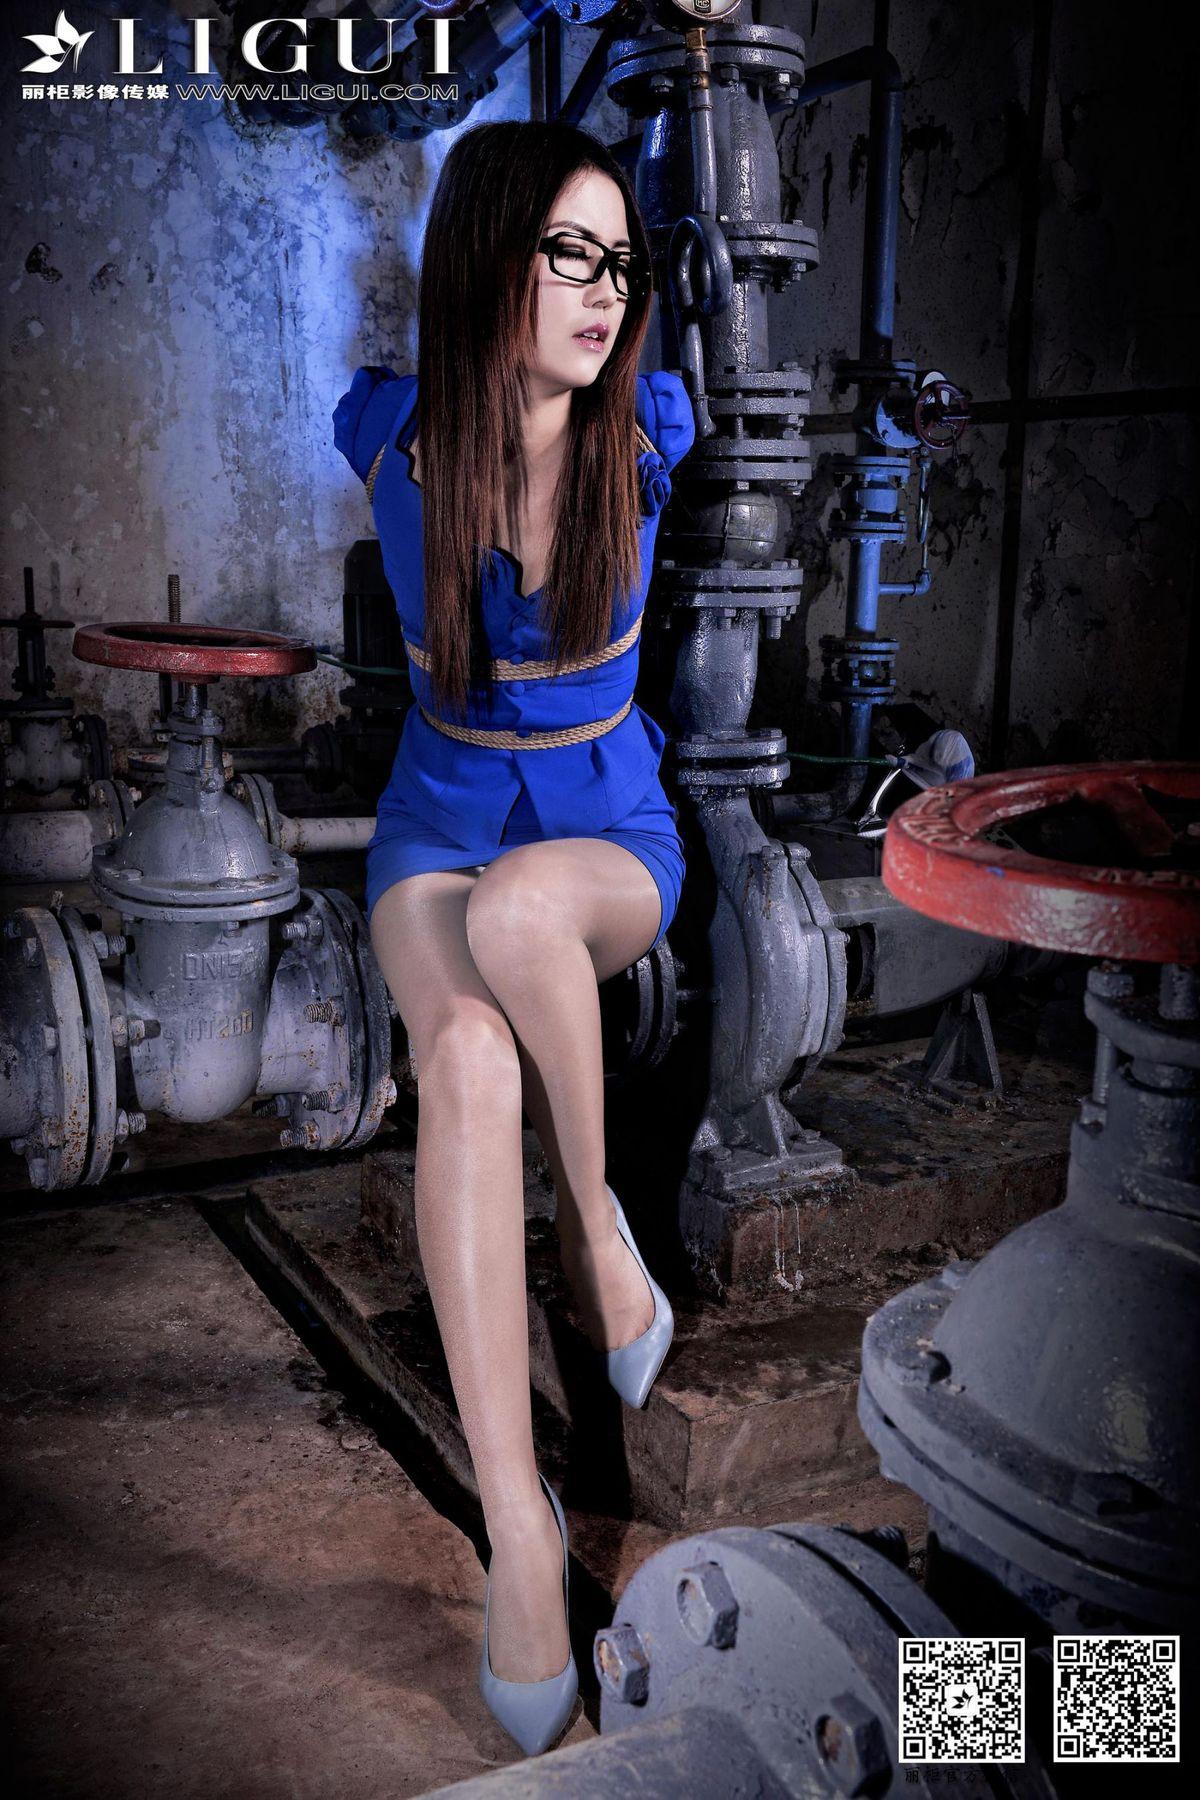 Model 可馨《空姐捆綁繩藝》上下全集 [麗柜美束LiGui] 美腿玉足寫真圖片(6) -美女寫真美女圖片大全-高清美女圖庫